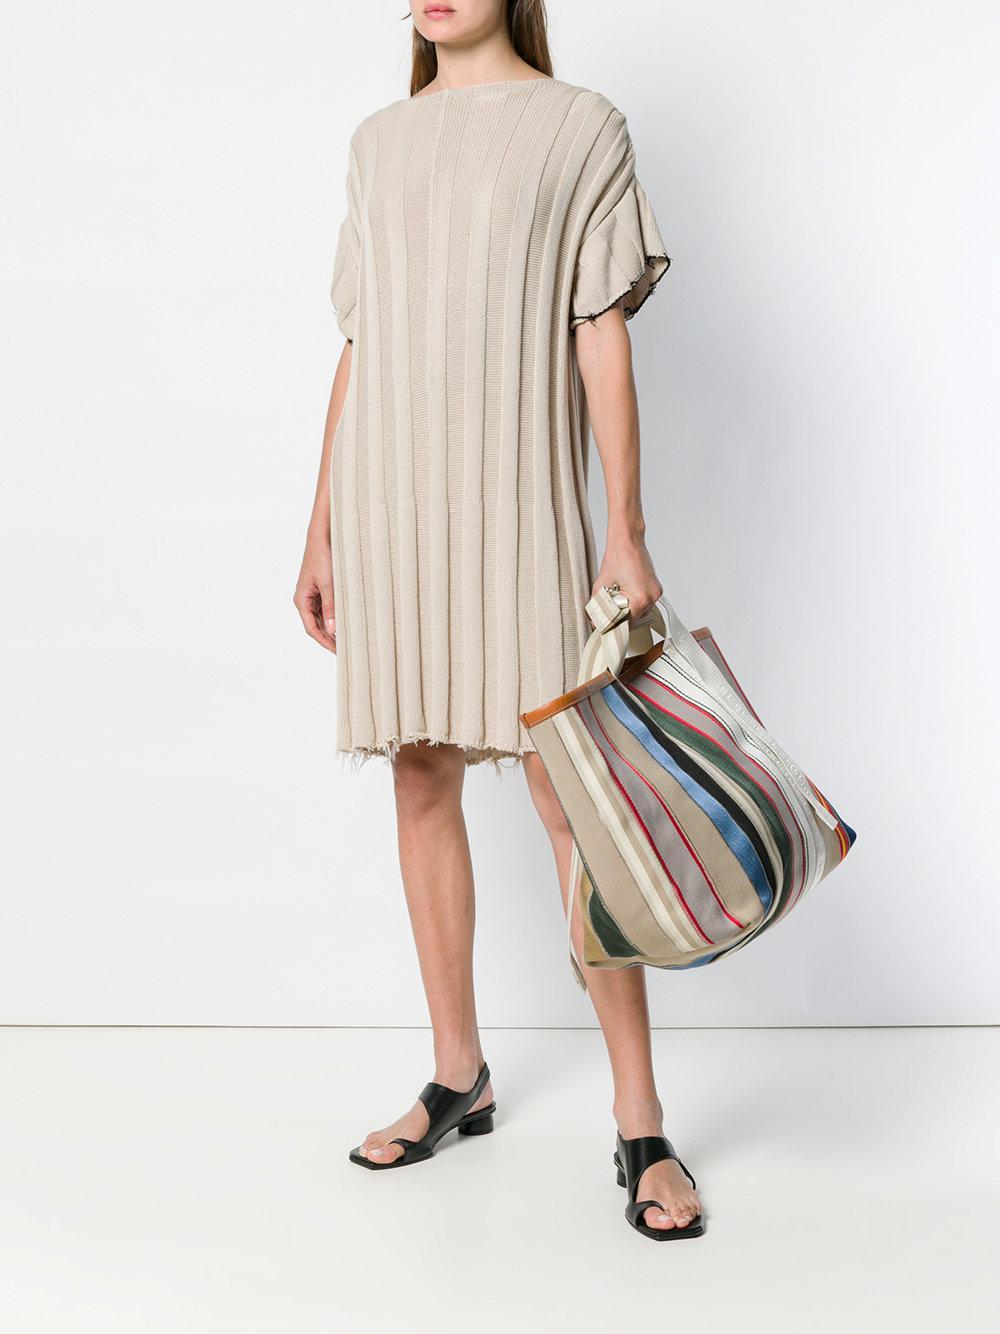 Maison Margiela Striped Tote Bag